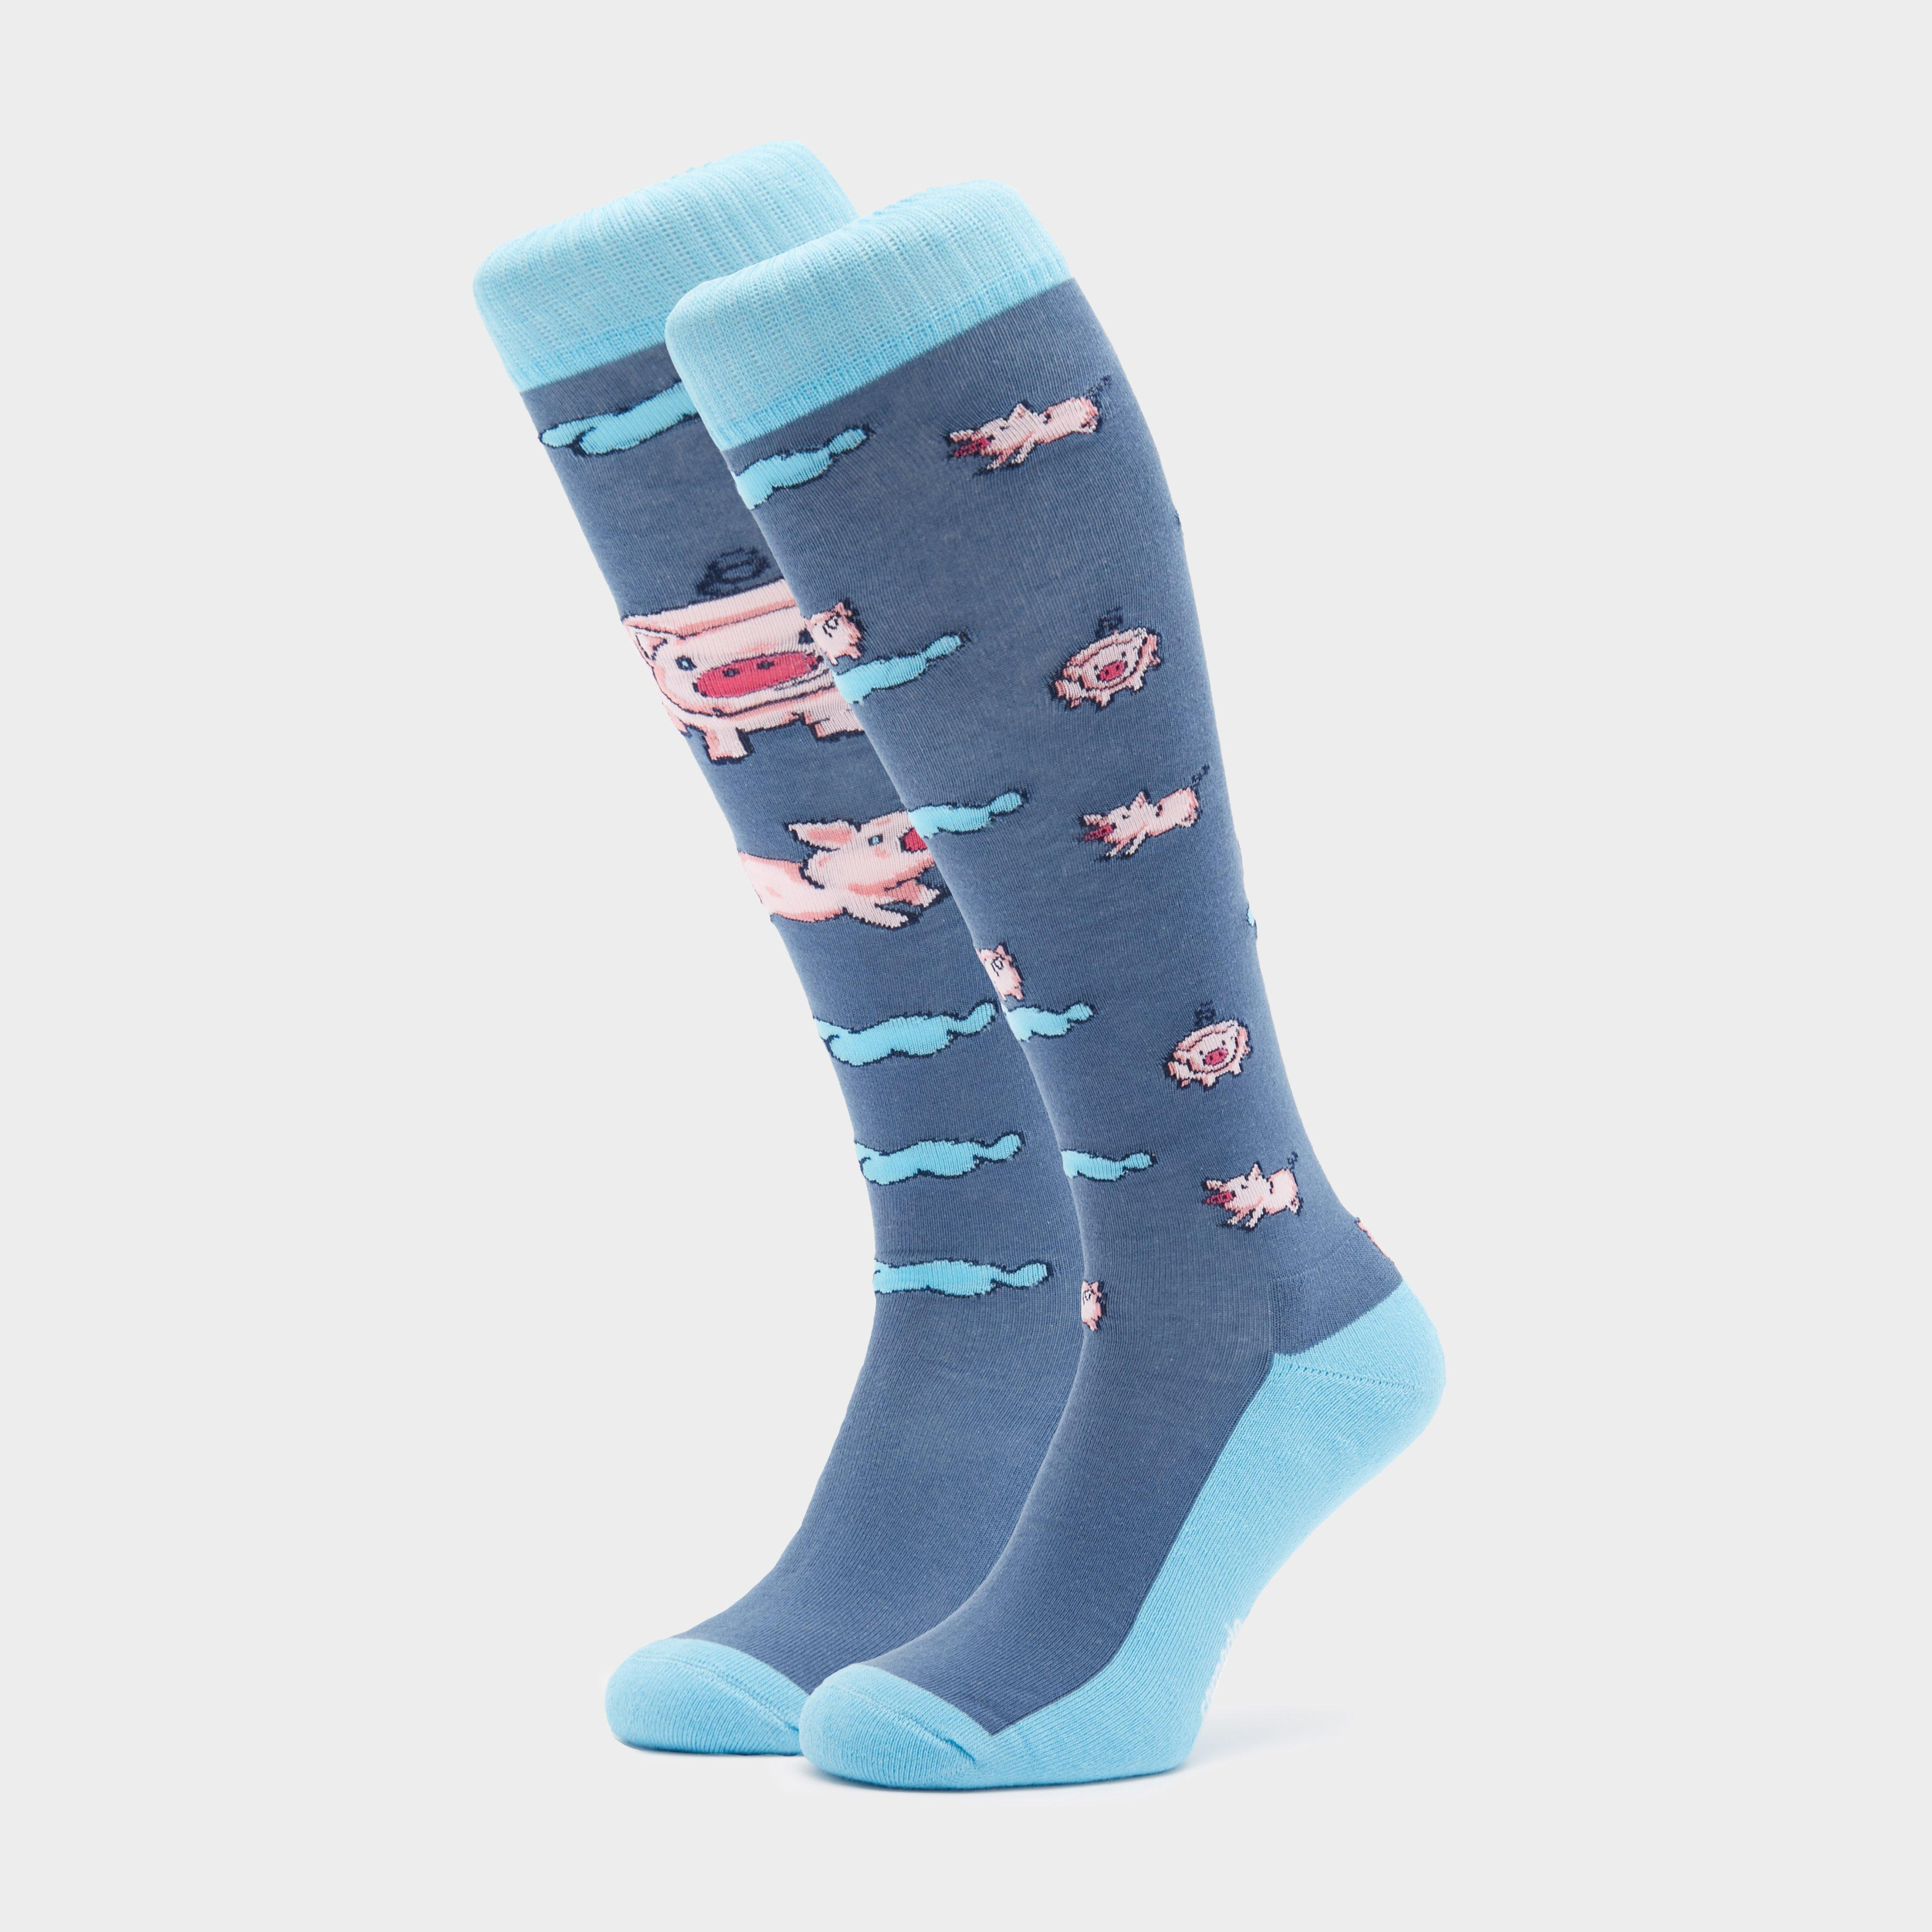 Image of Comodo Adults Novelty Fun Socks Pigs - Blue/Blue, Blue/BLUE